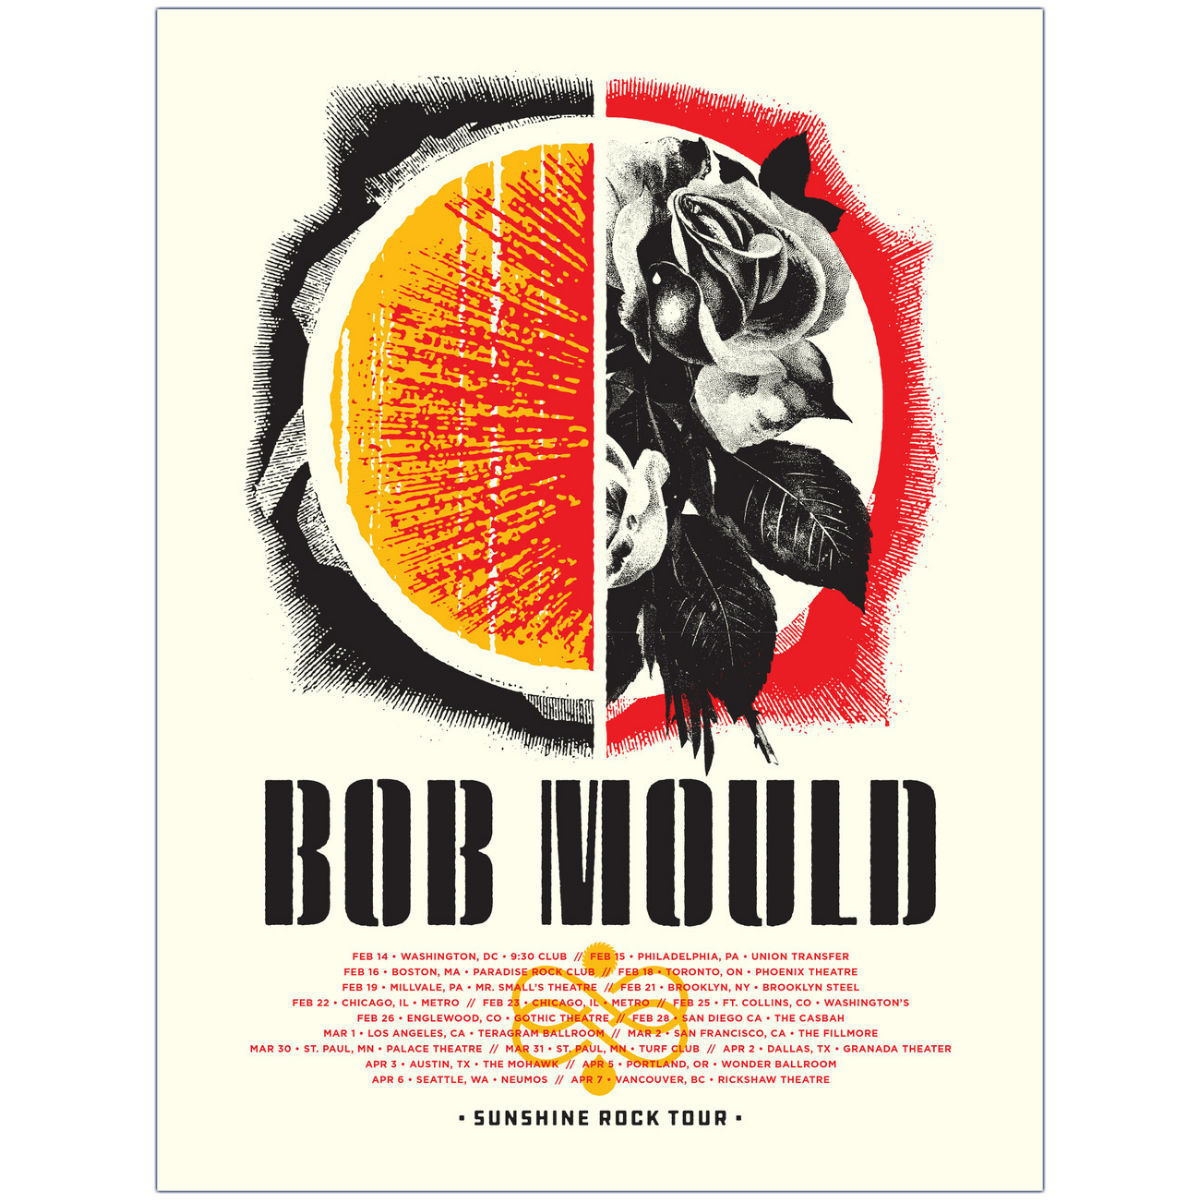 Sunshine Rock Tour Poster